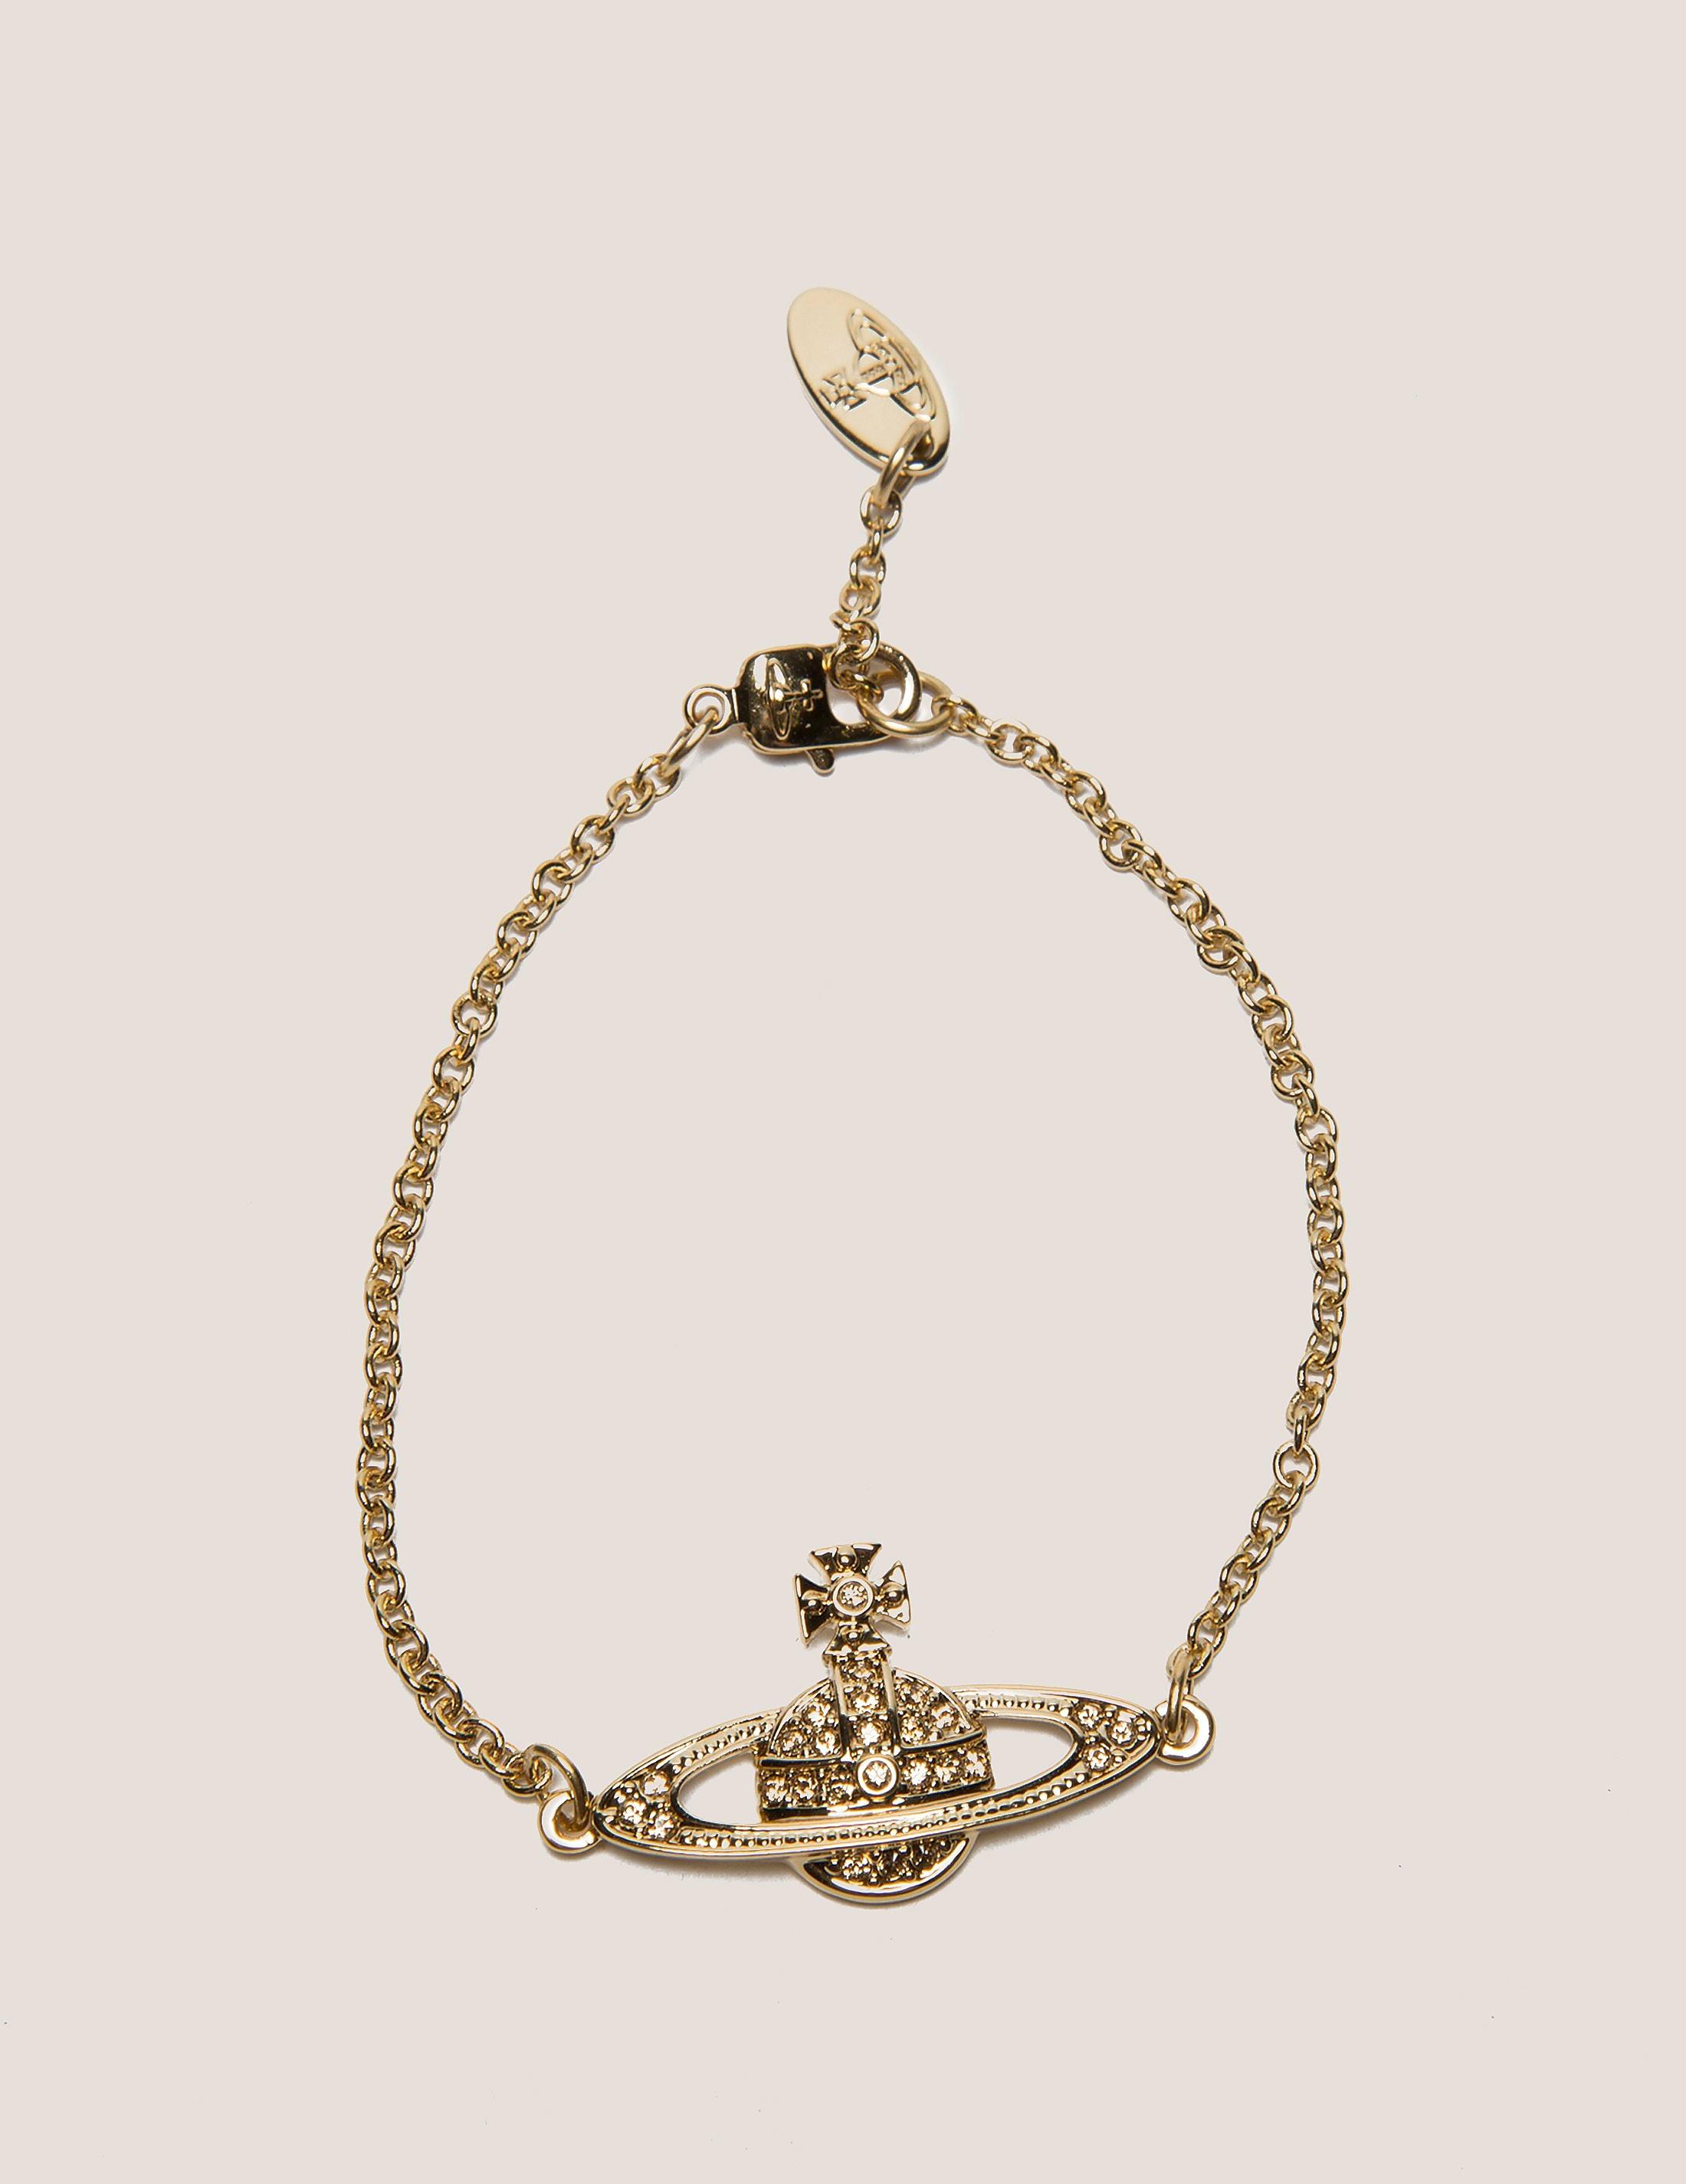 Vivienne Westwood Mini Brass Relief Chain Bracelet